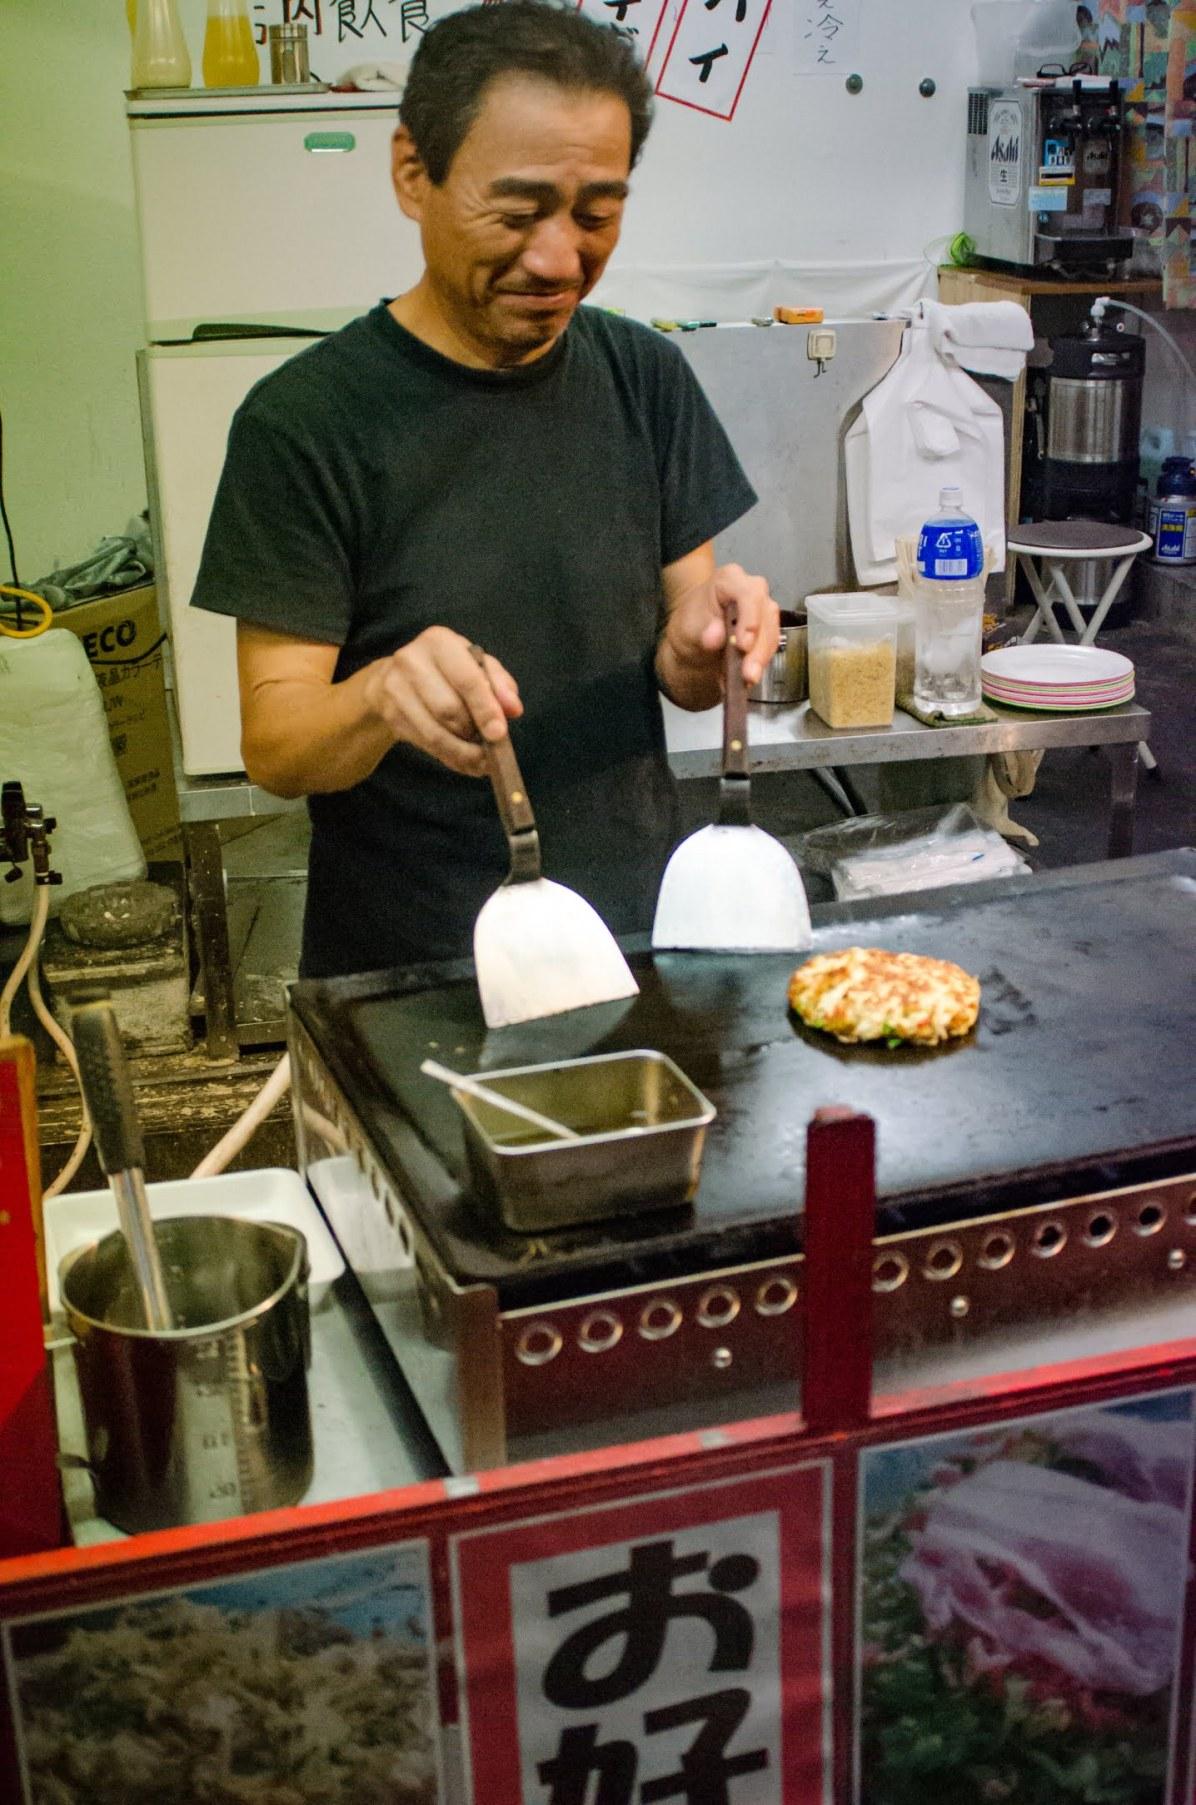 Where to Stay in Osaka- Osaka Travel Blog: Okonomiyaki - Things to do in Oaxaca